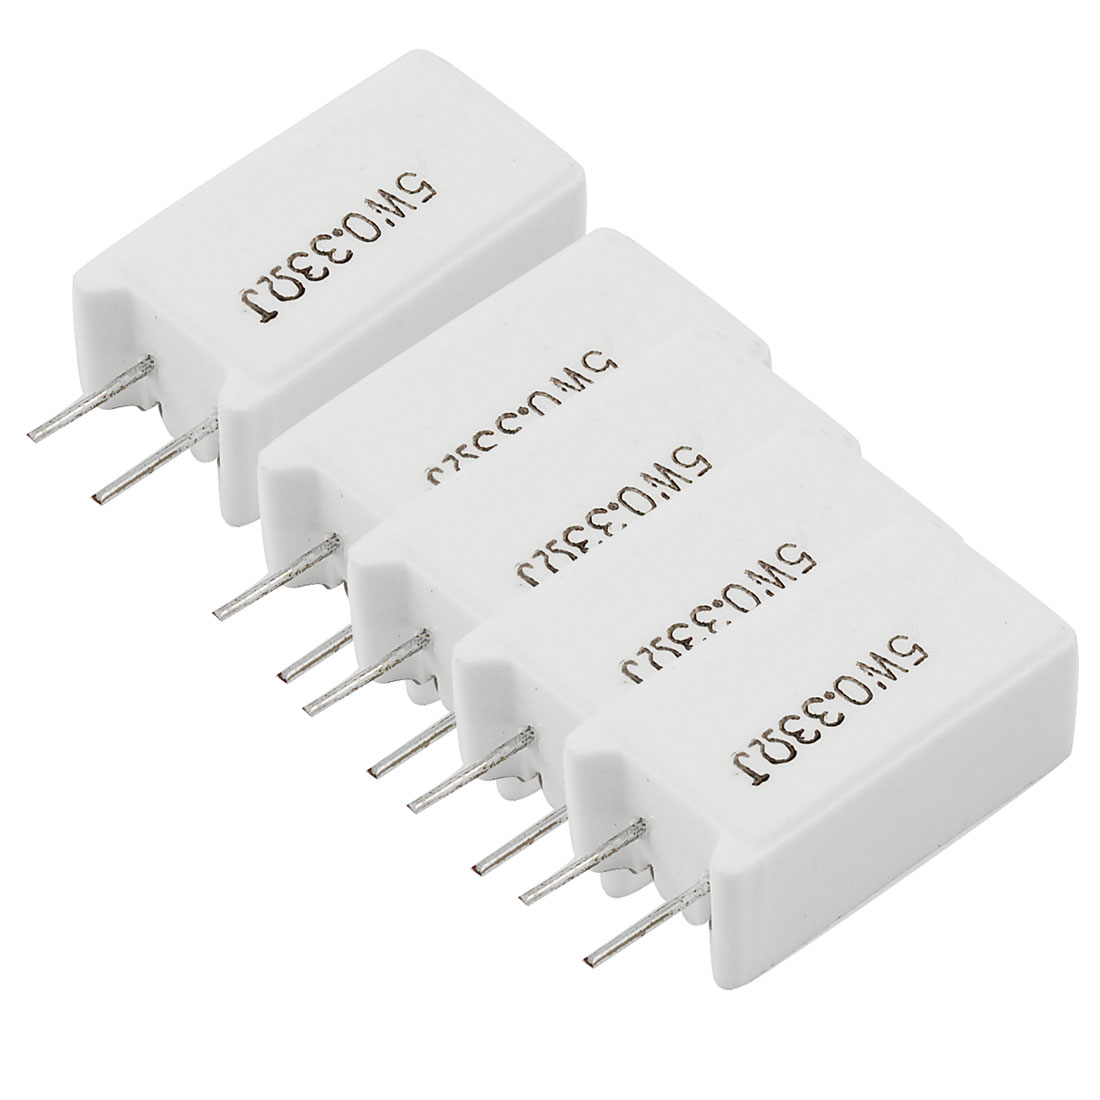 5 x 0.33 Ohm 5 Watt Wirewound Radial Lead Ceramic Cement Resistors White